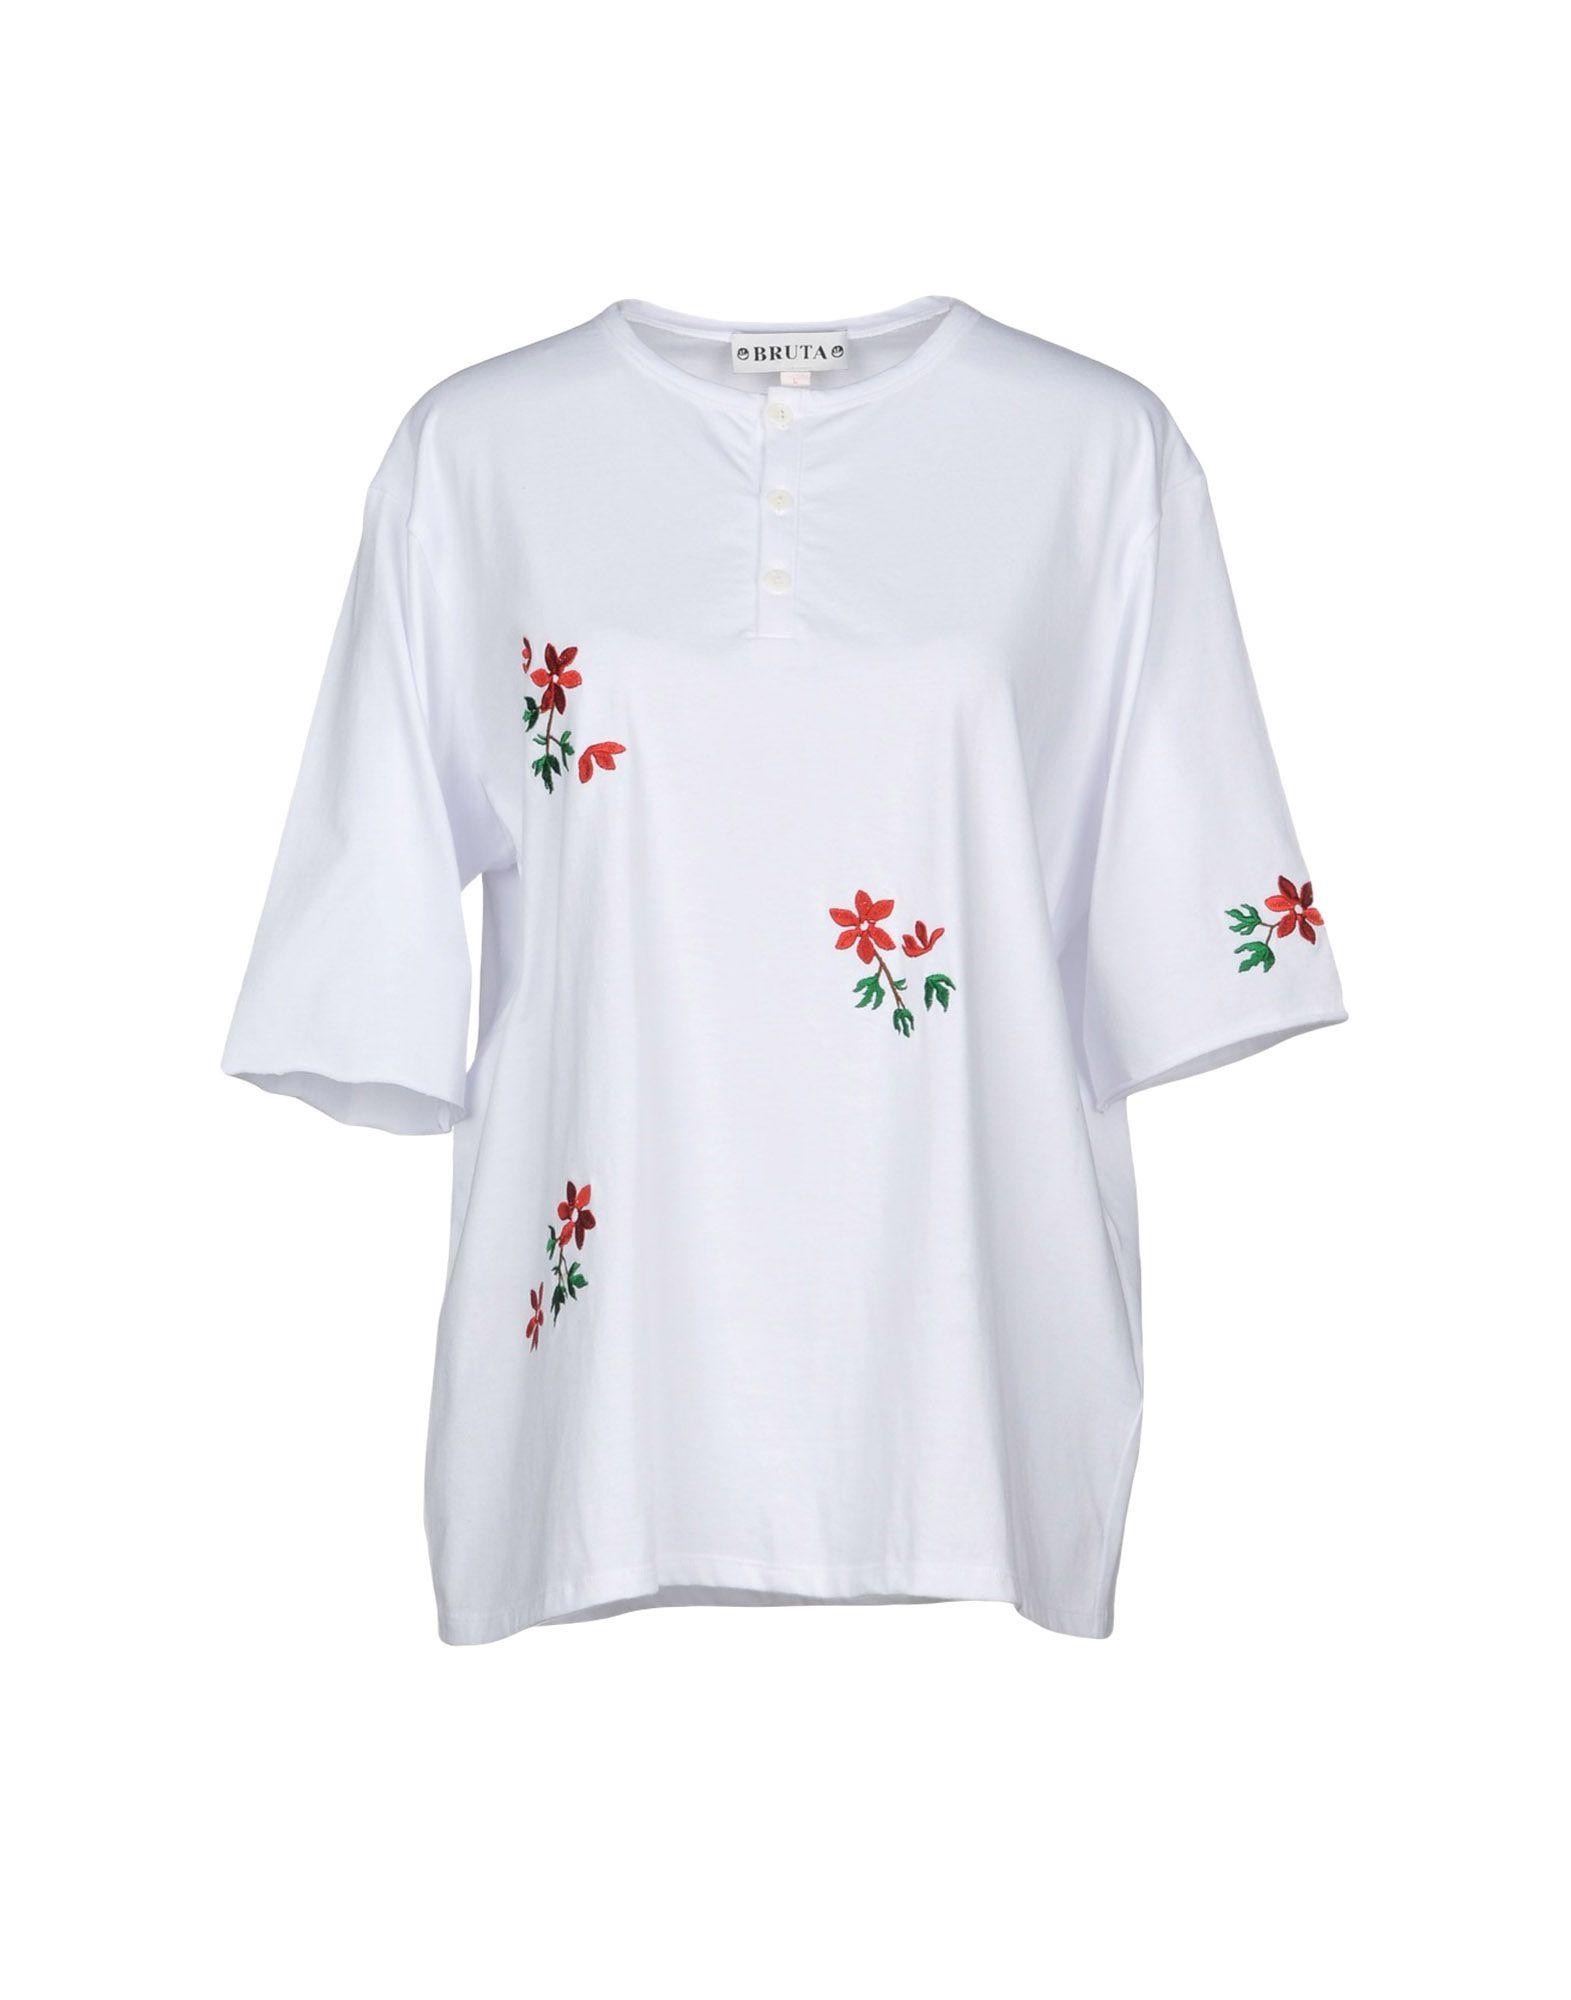 BRUTA T-Shirt in White